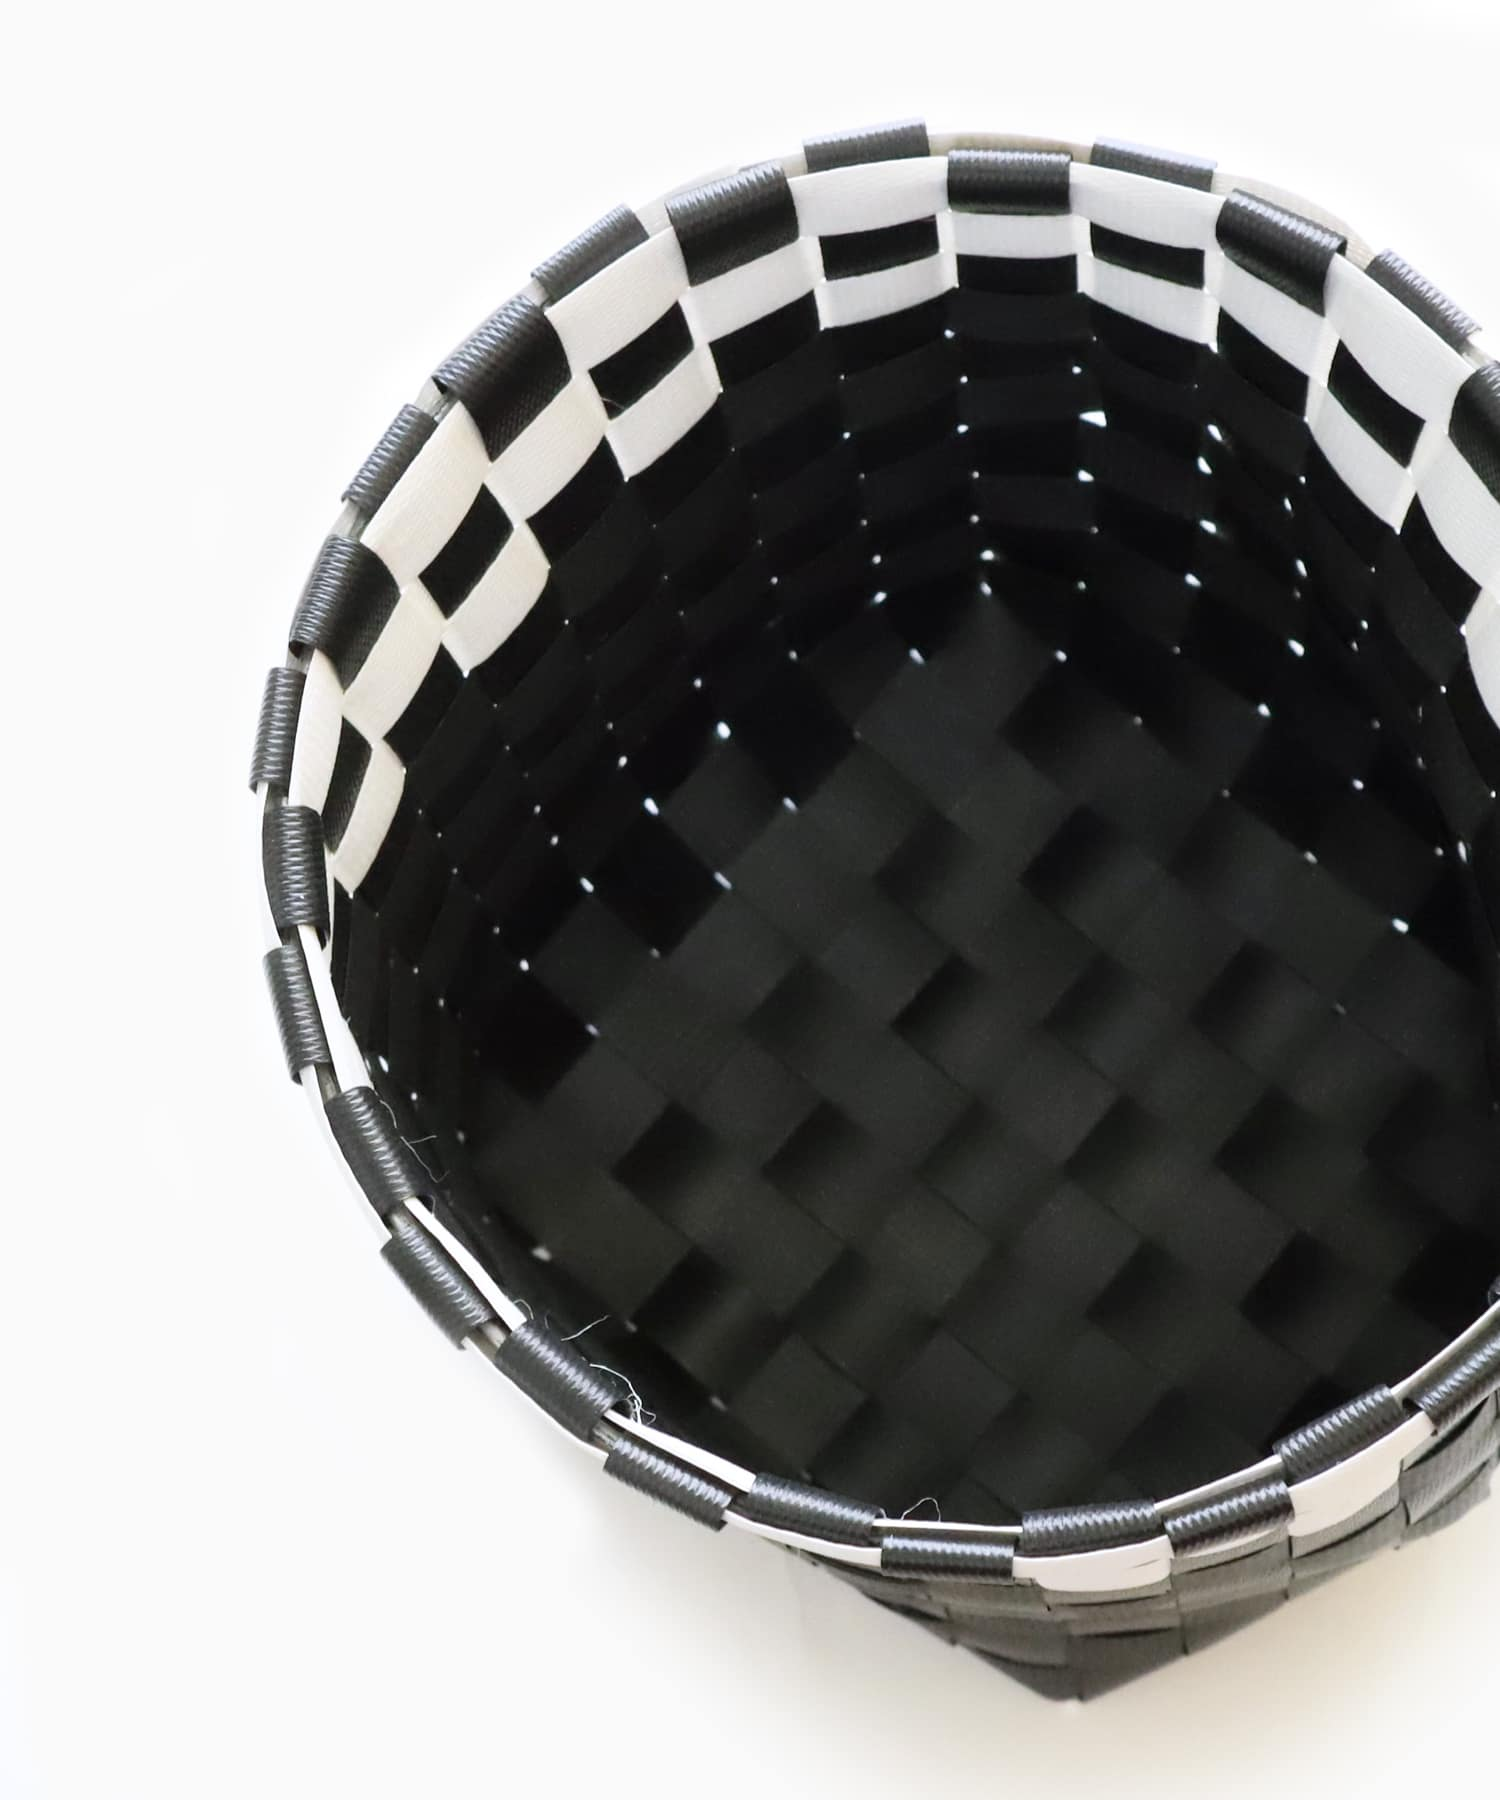 ASOKO(アソコ) 編み込みバスケット